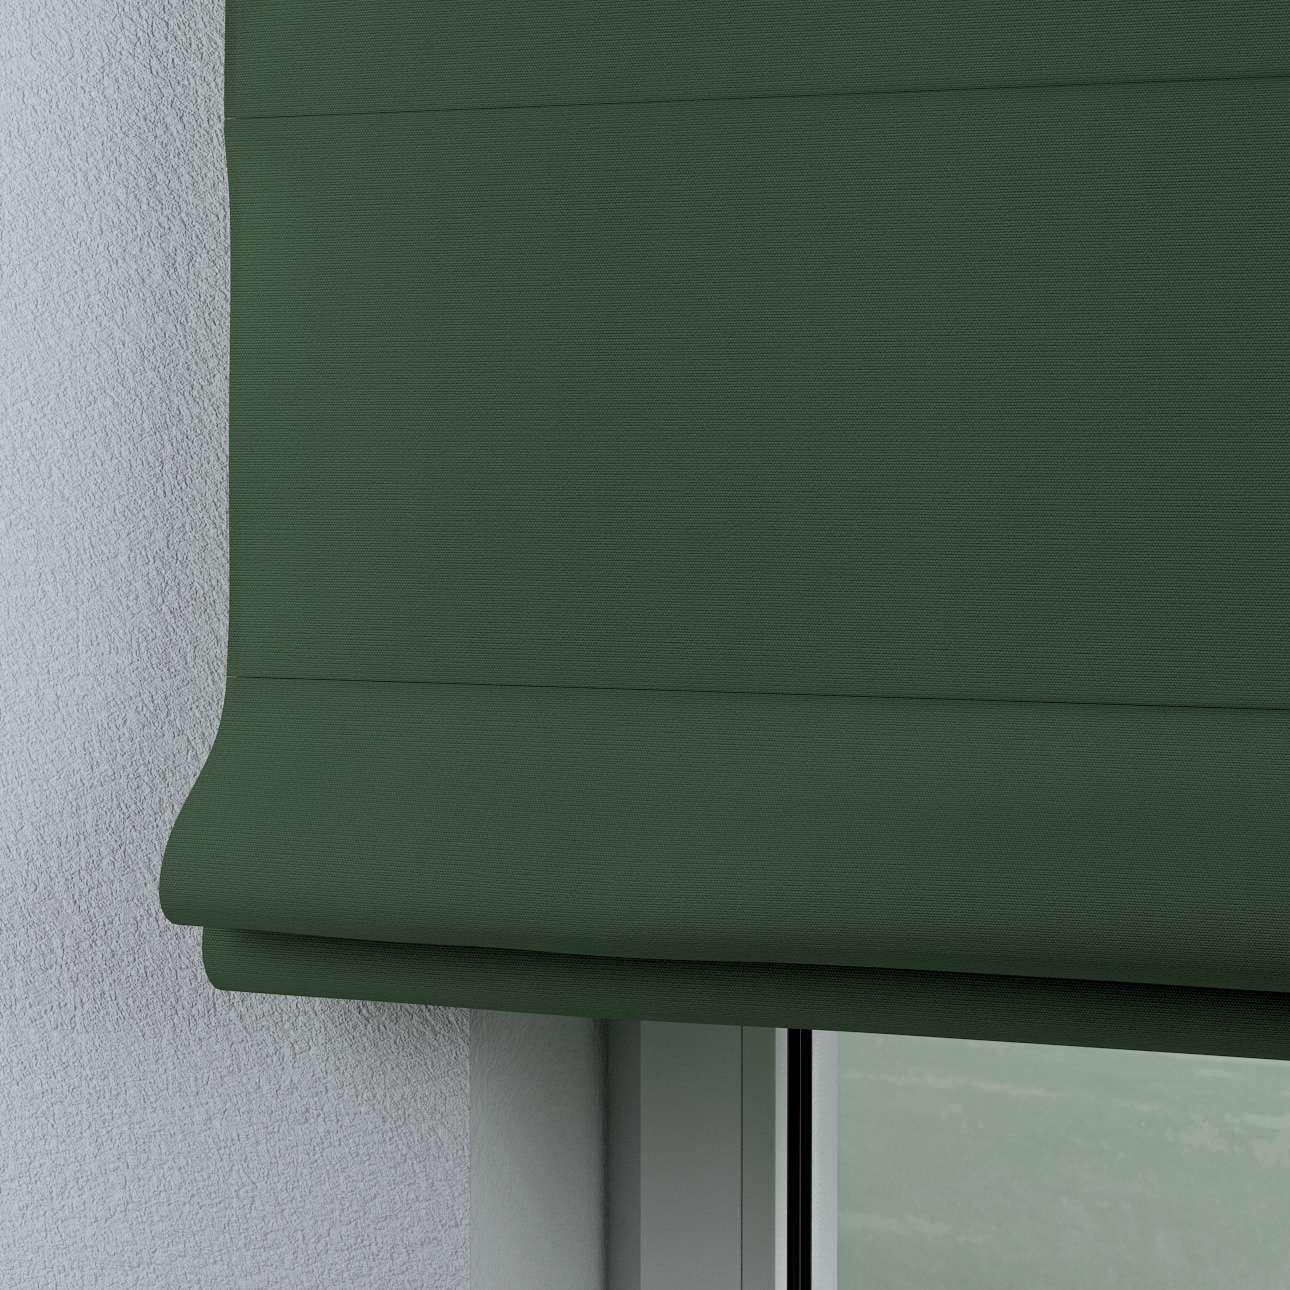 Capri roman blind 80 x 170 cm (31.5 x 67 inch) in collection Cotton Panama, fabric: 702-06